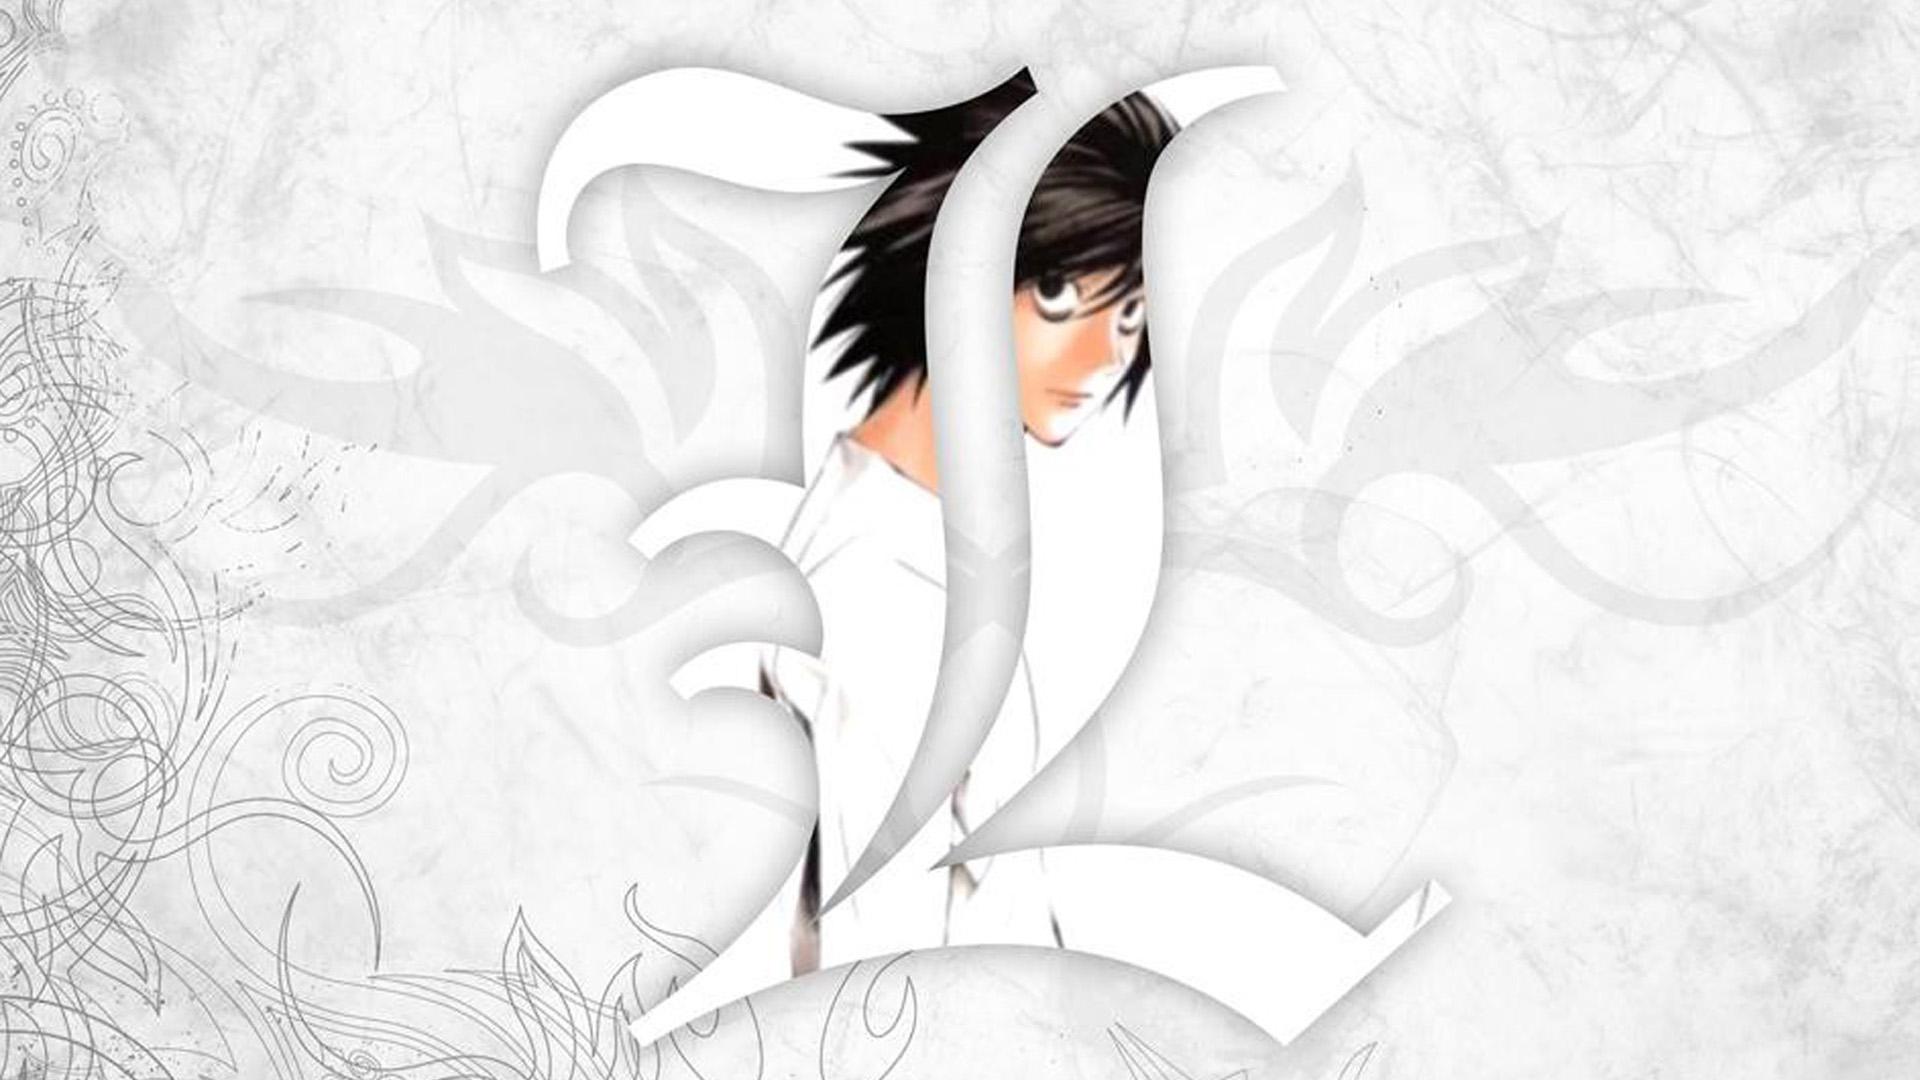 Death Note L Wallpaper - WallpaperSafari